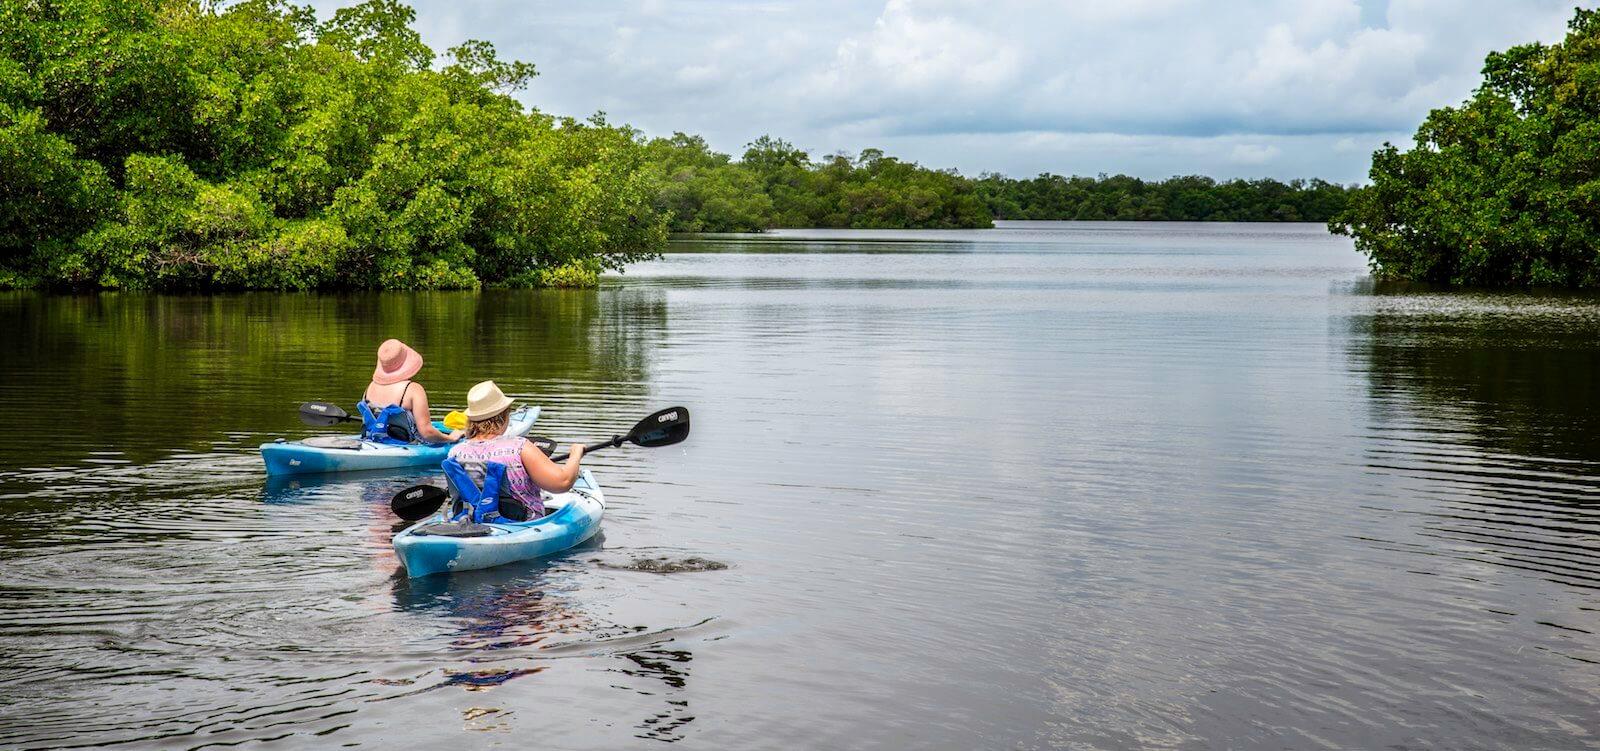 MustDo.com | Sanibel Island, Florida kayak tours. Photo by Jennifer Brinkman.